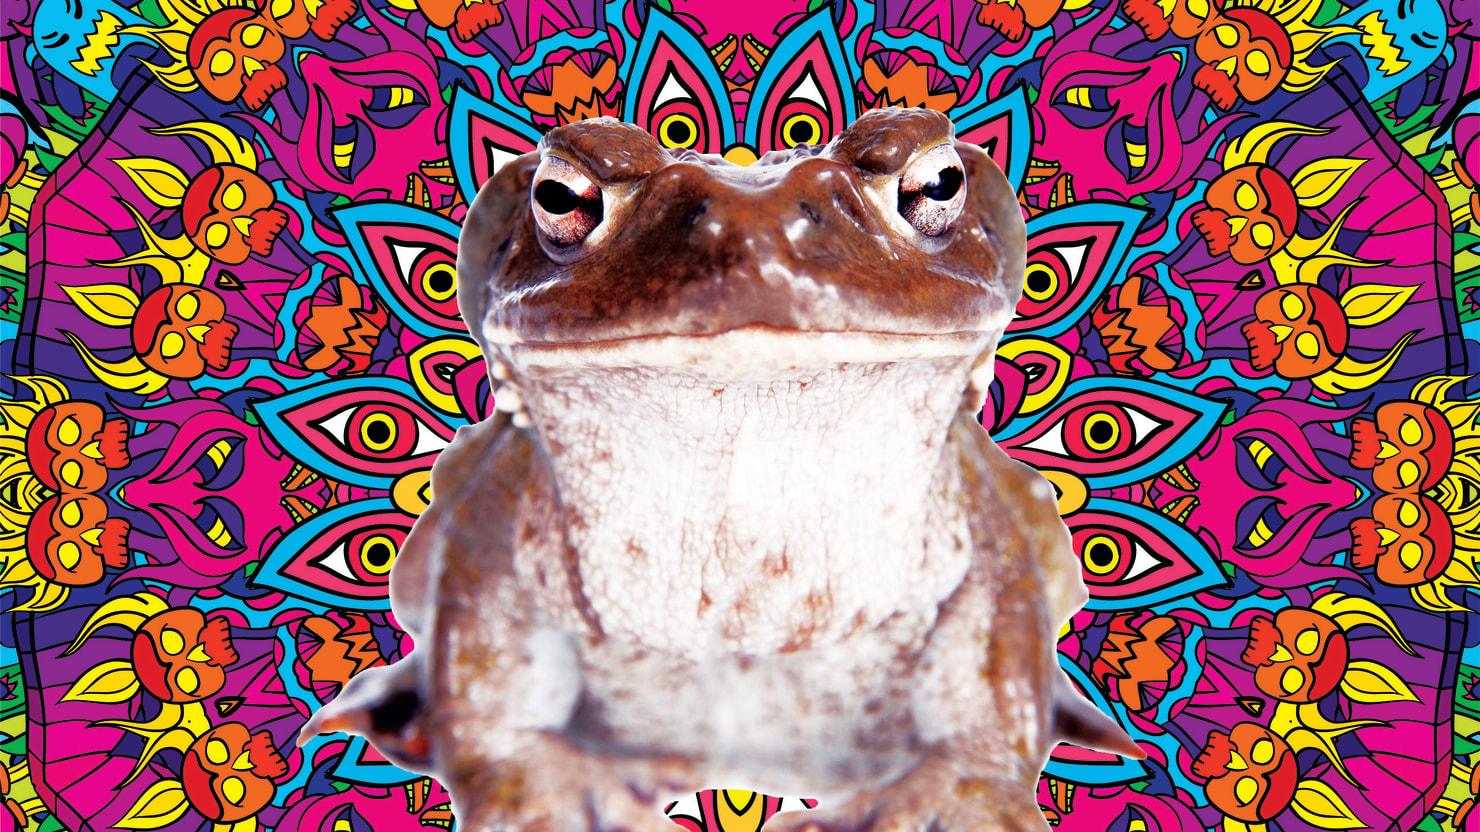 Toad Venom: Weird Trip or Cancer Cure?